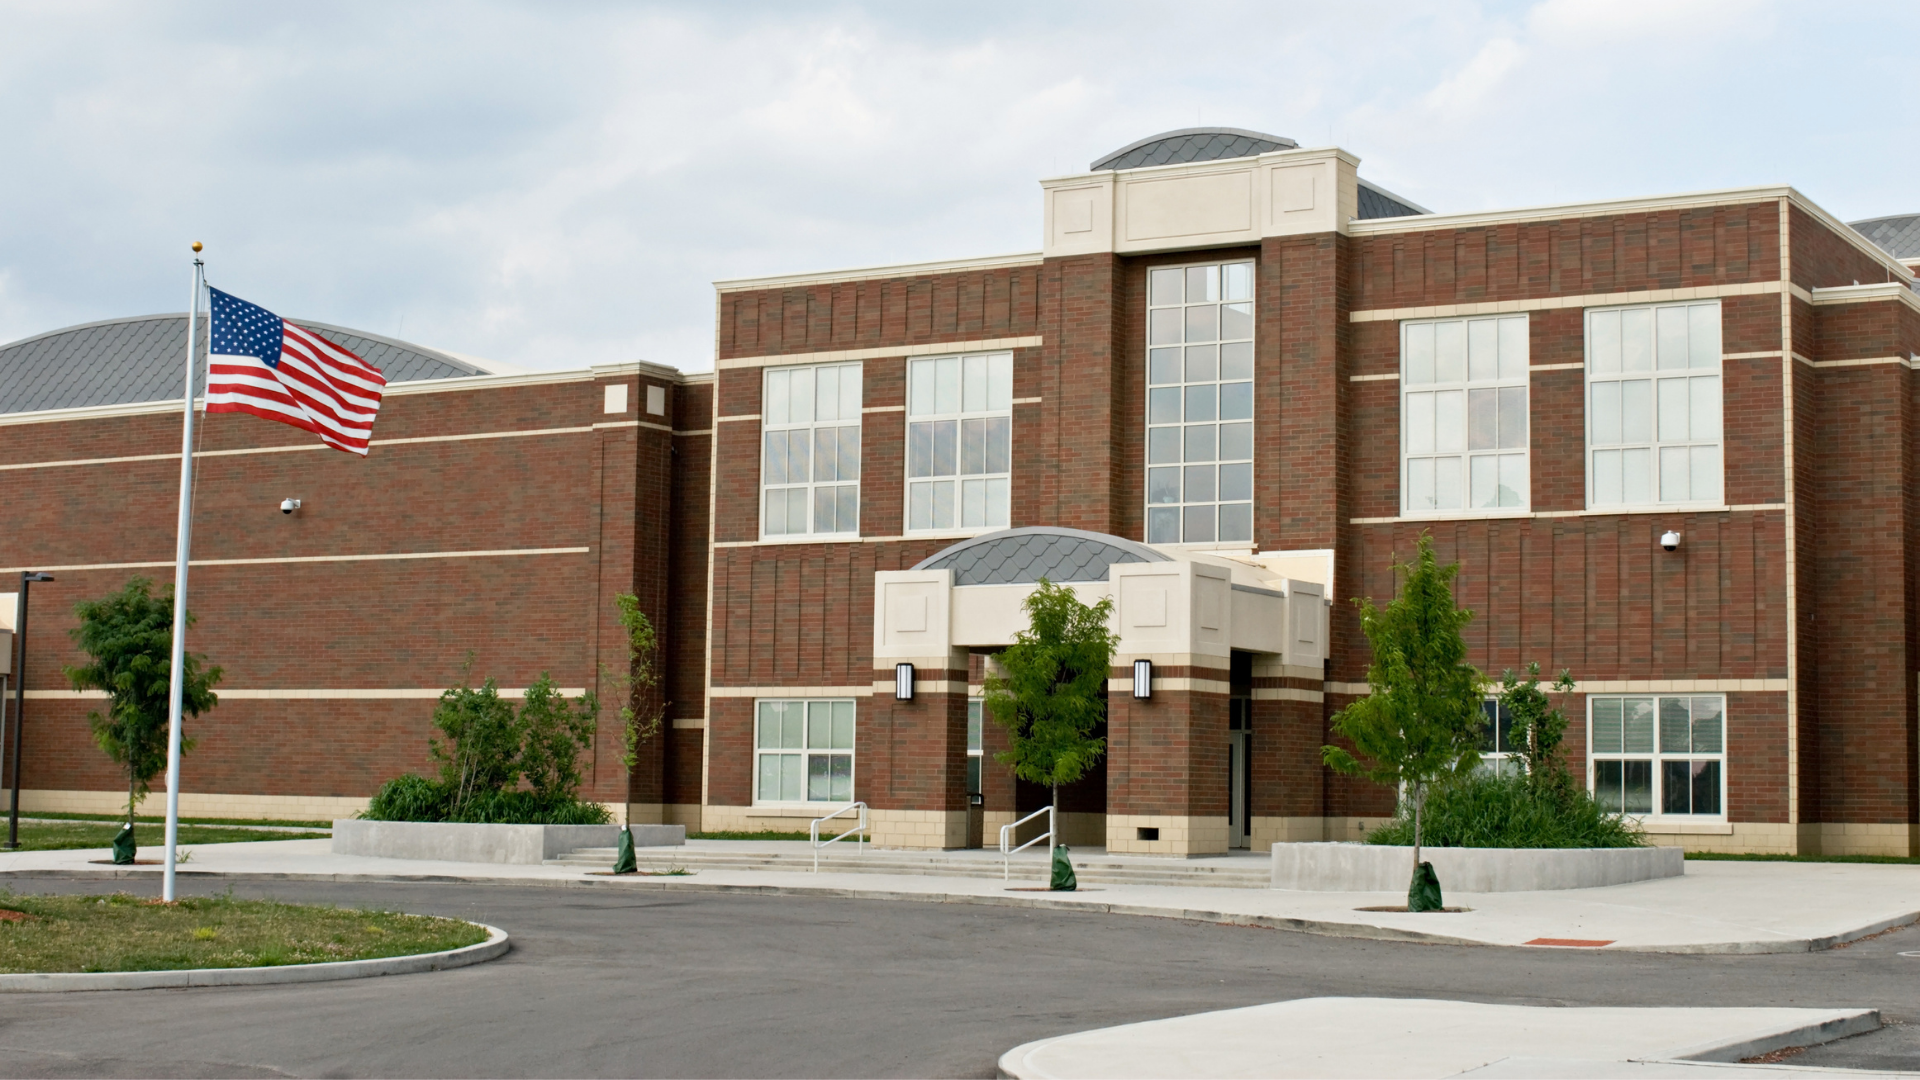 Image shows a school building.